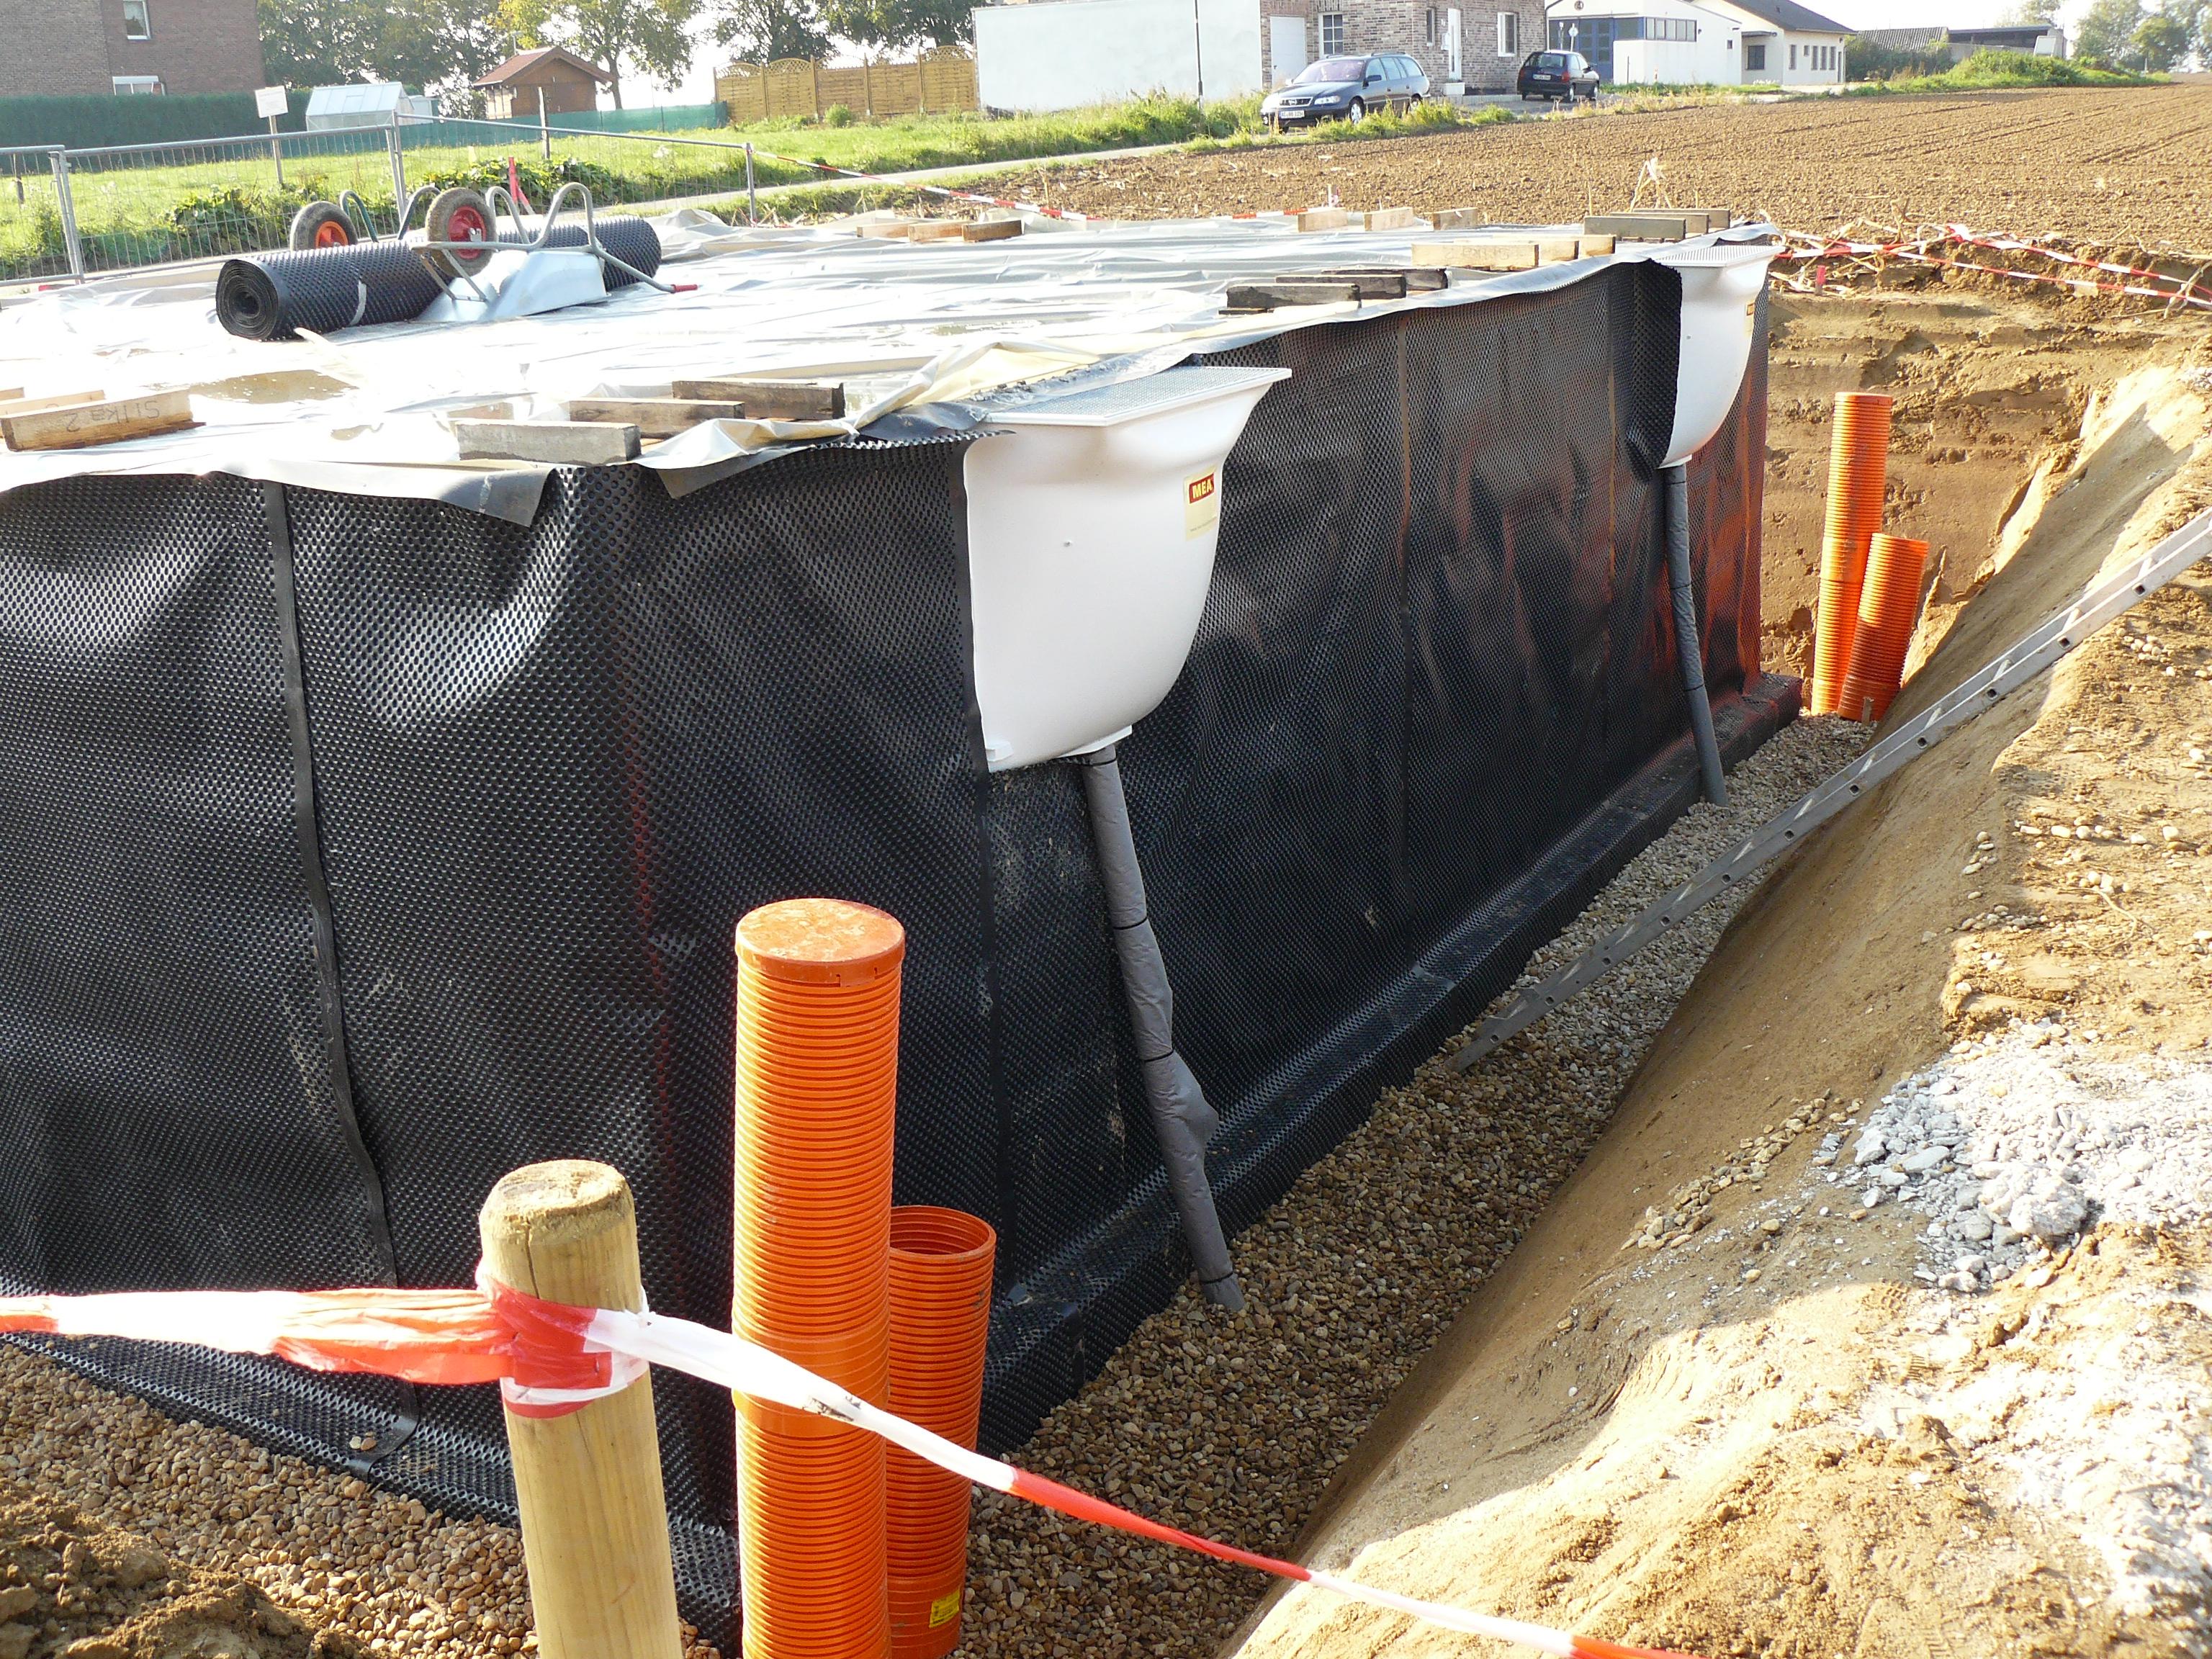 drainage am haus pp95 hitoiro. Black Bedroom Furniture Sets. Home Design Ideas